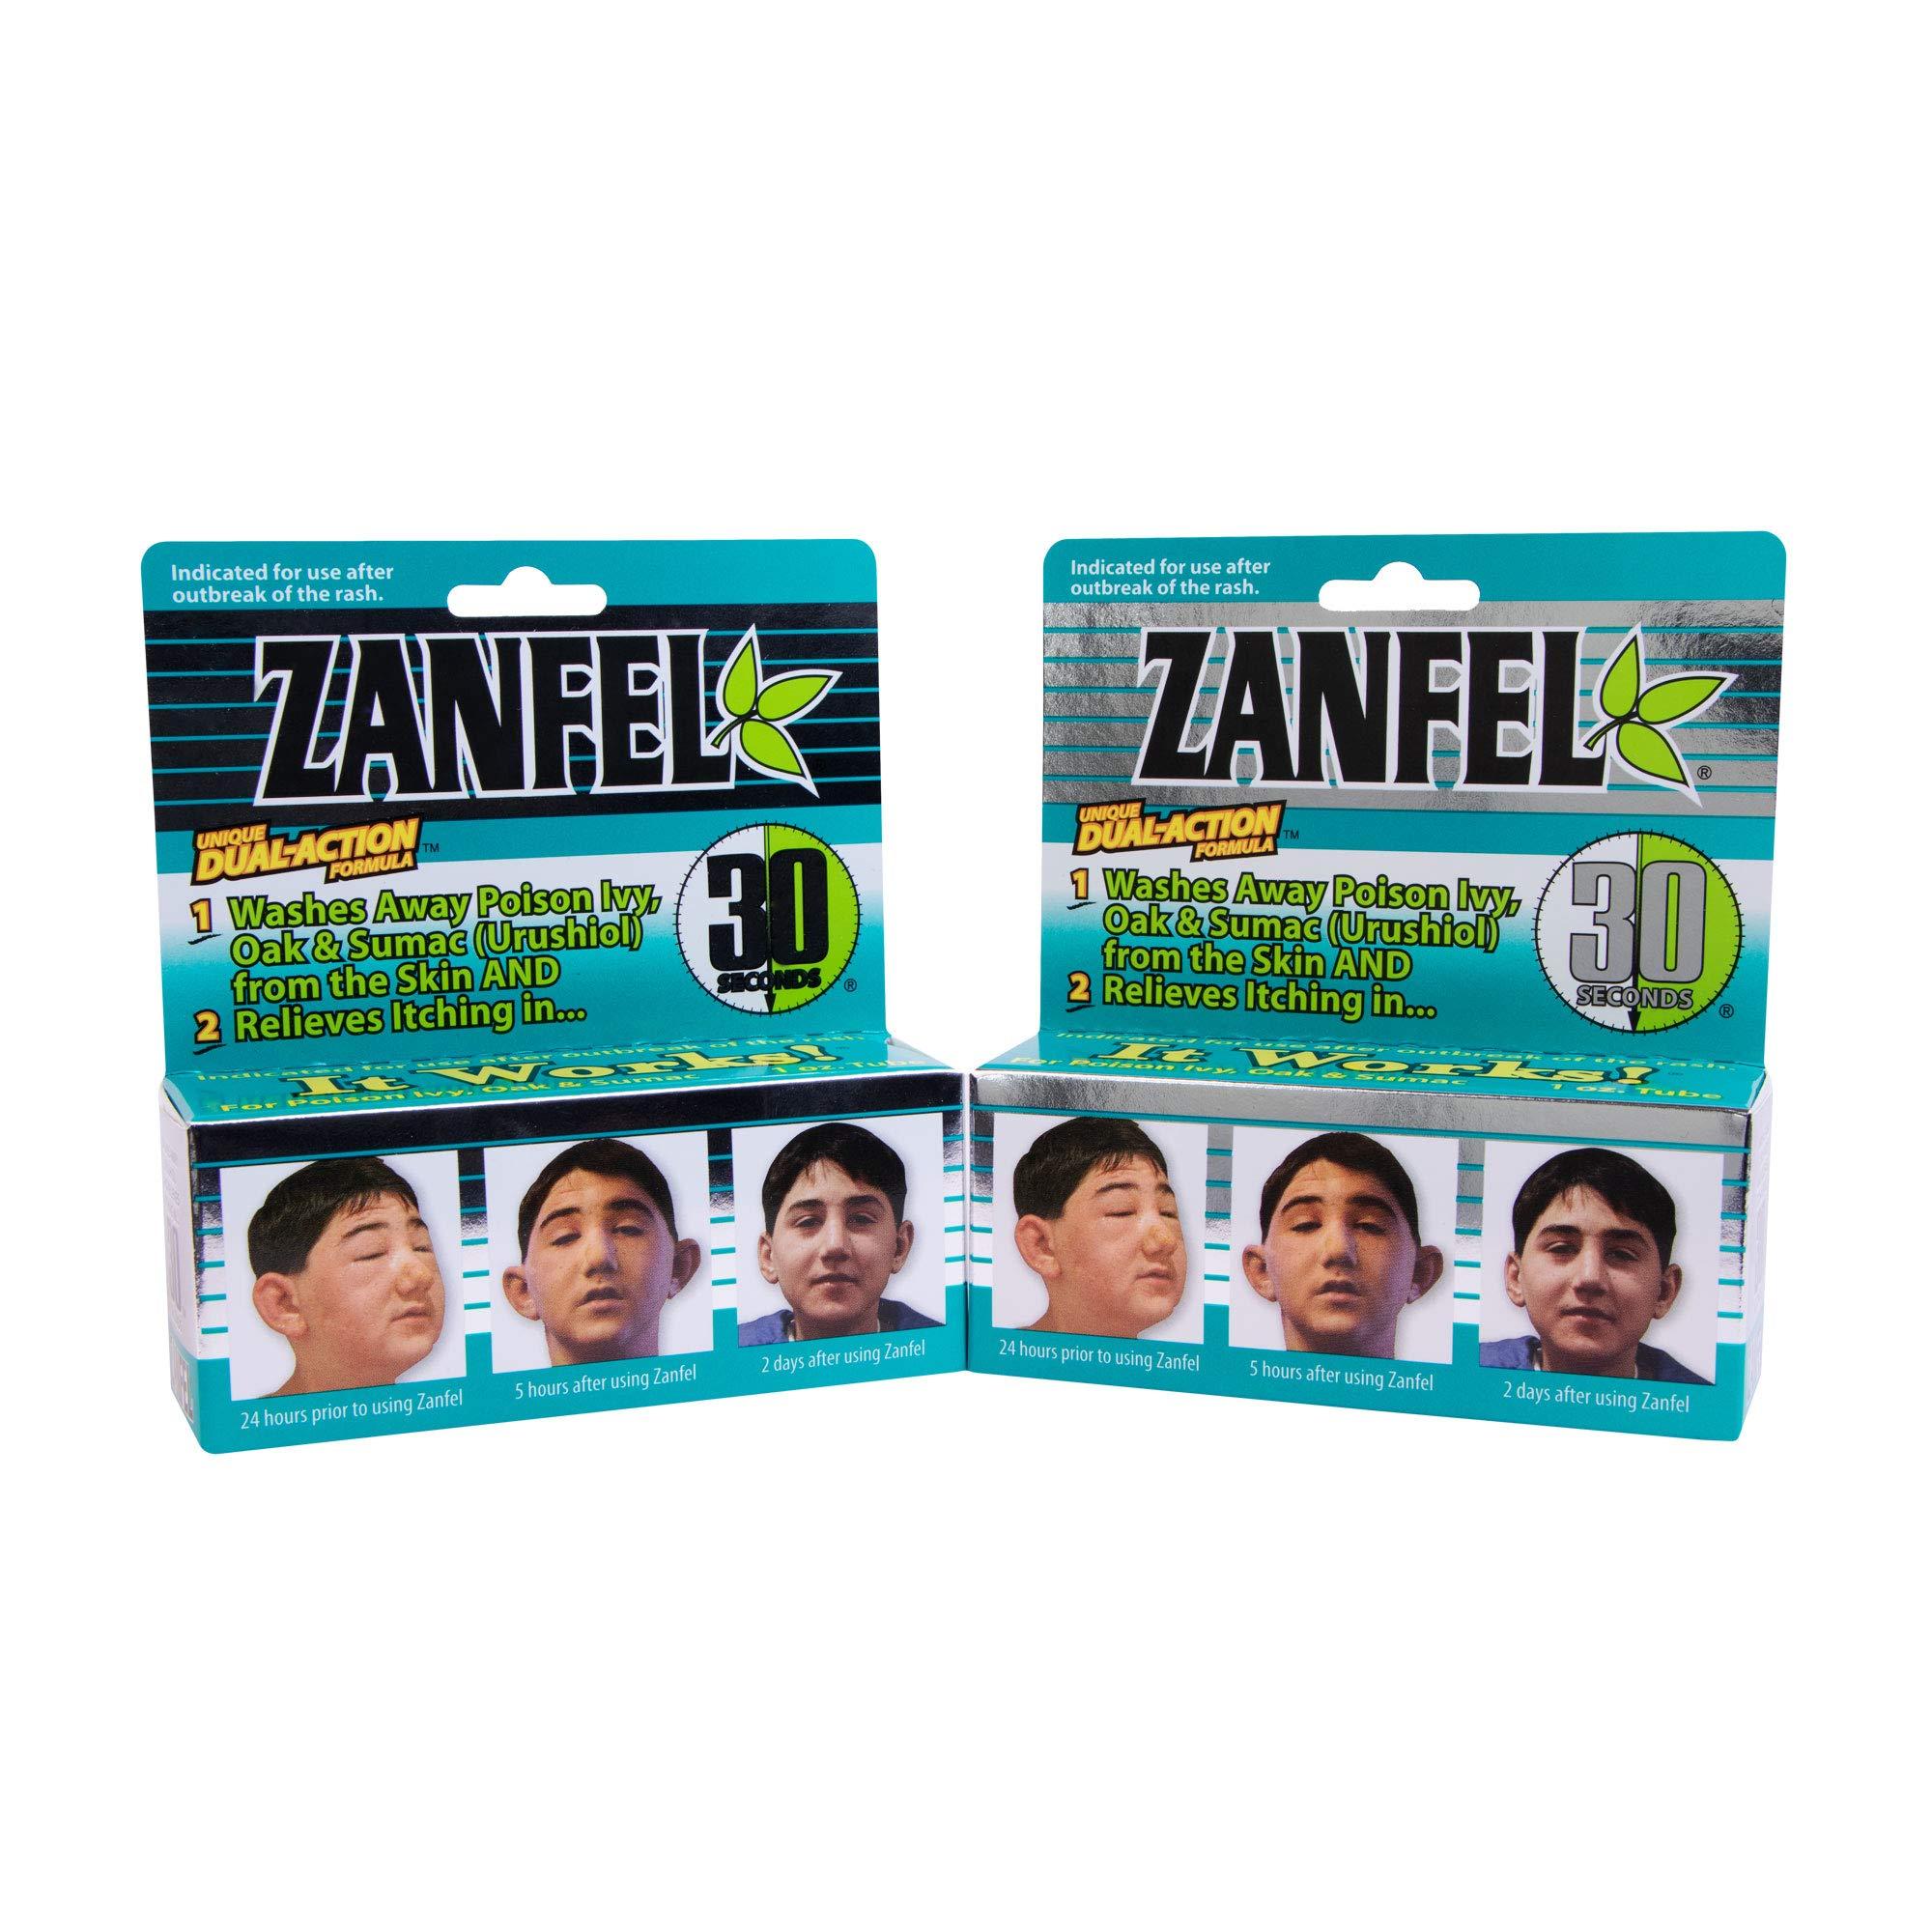 ZANFEL - Poison Ivy, Oak & Sumac Wash, 1 Oz - 2Pack by Zanfel